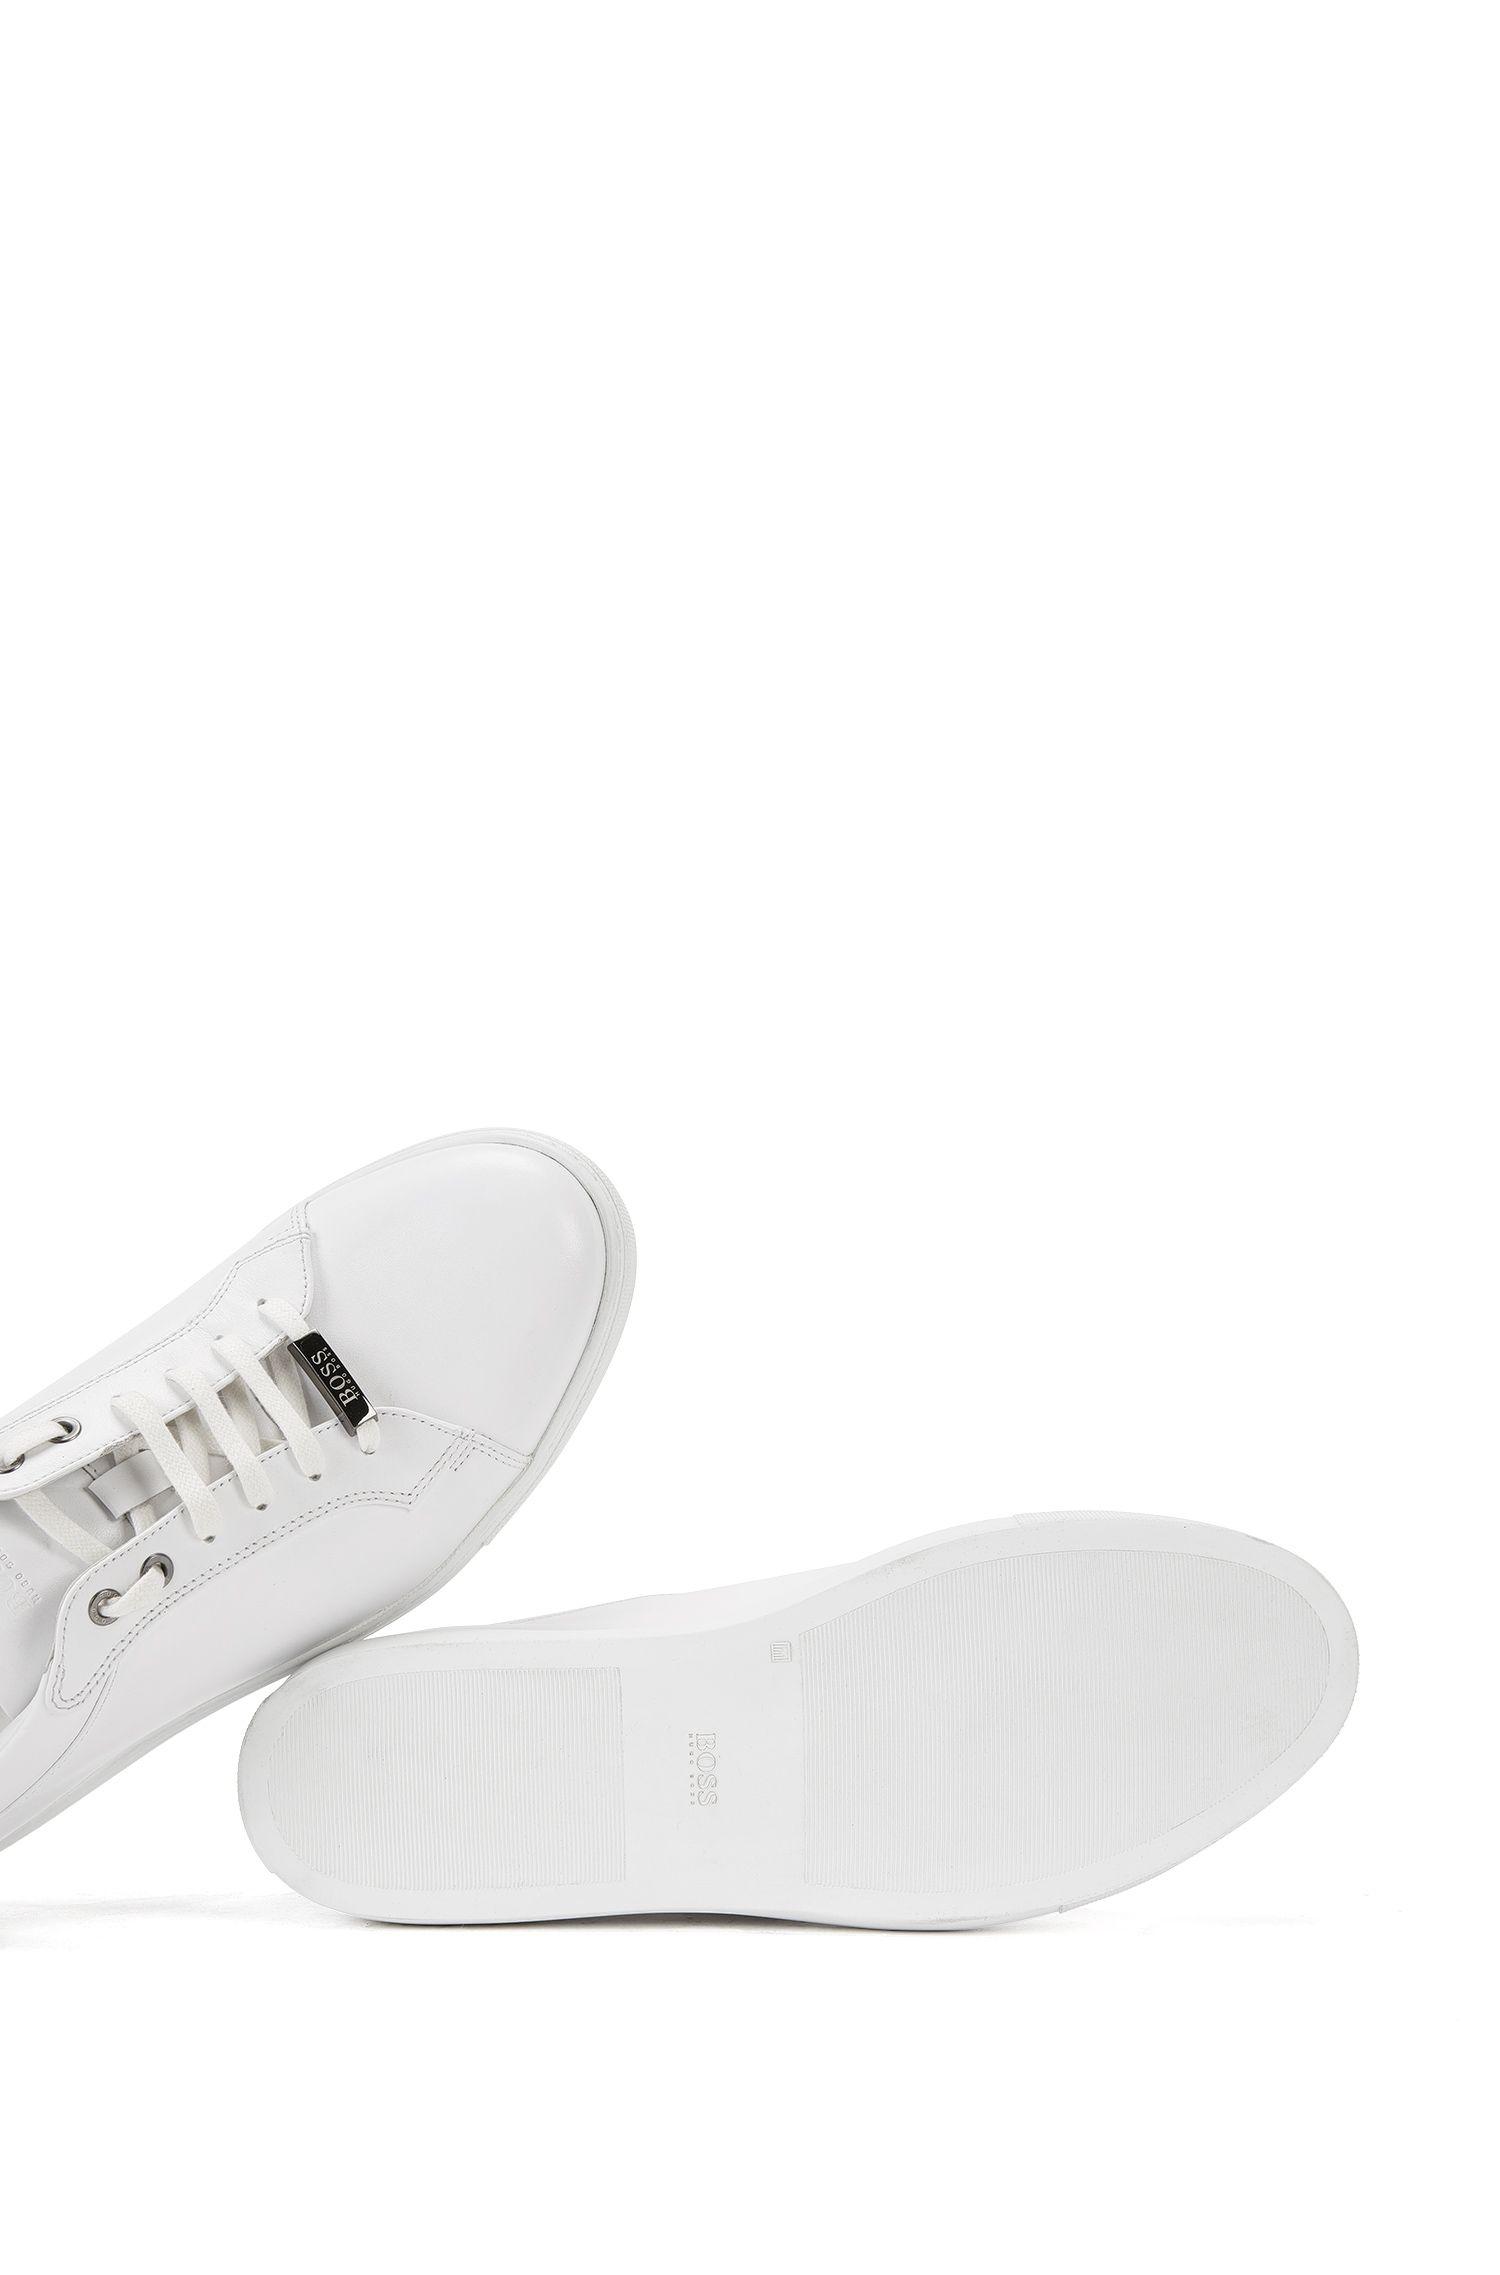 Leren vetersneakers met gemerkte zool